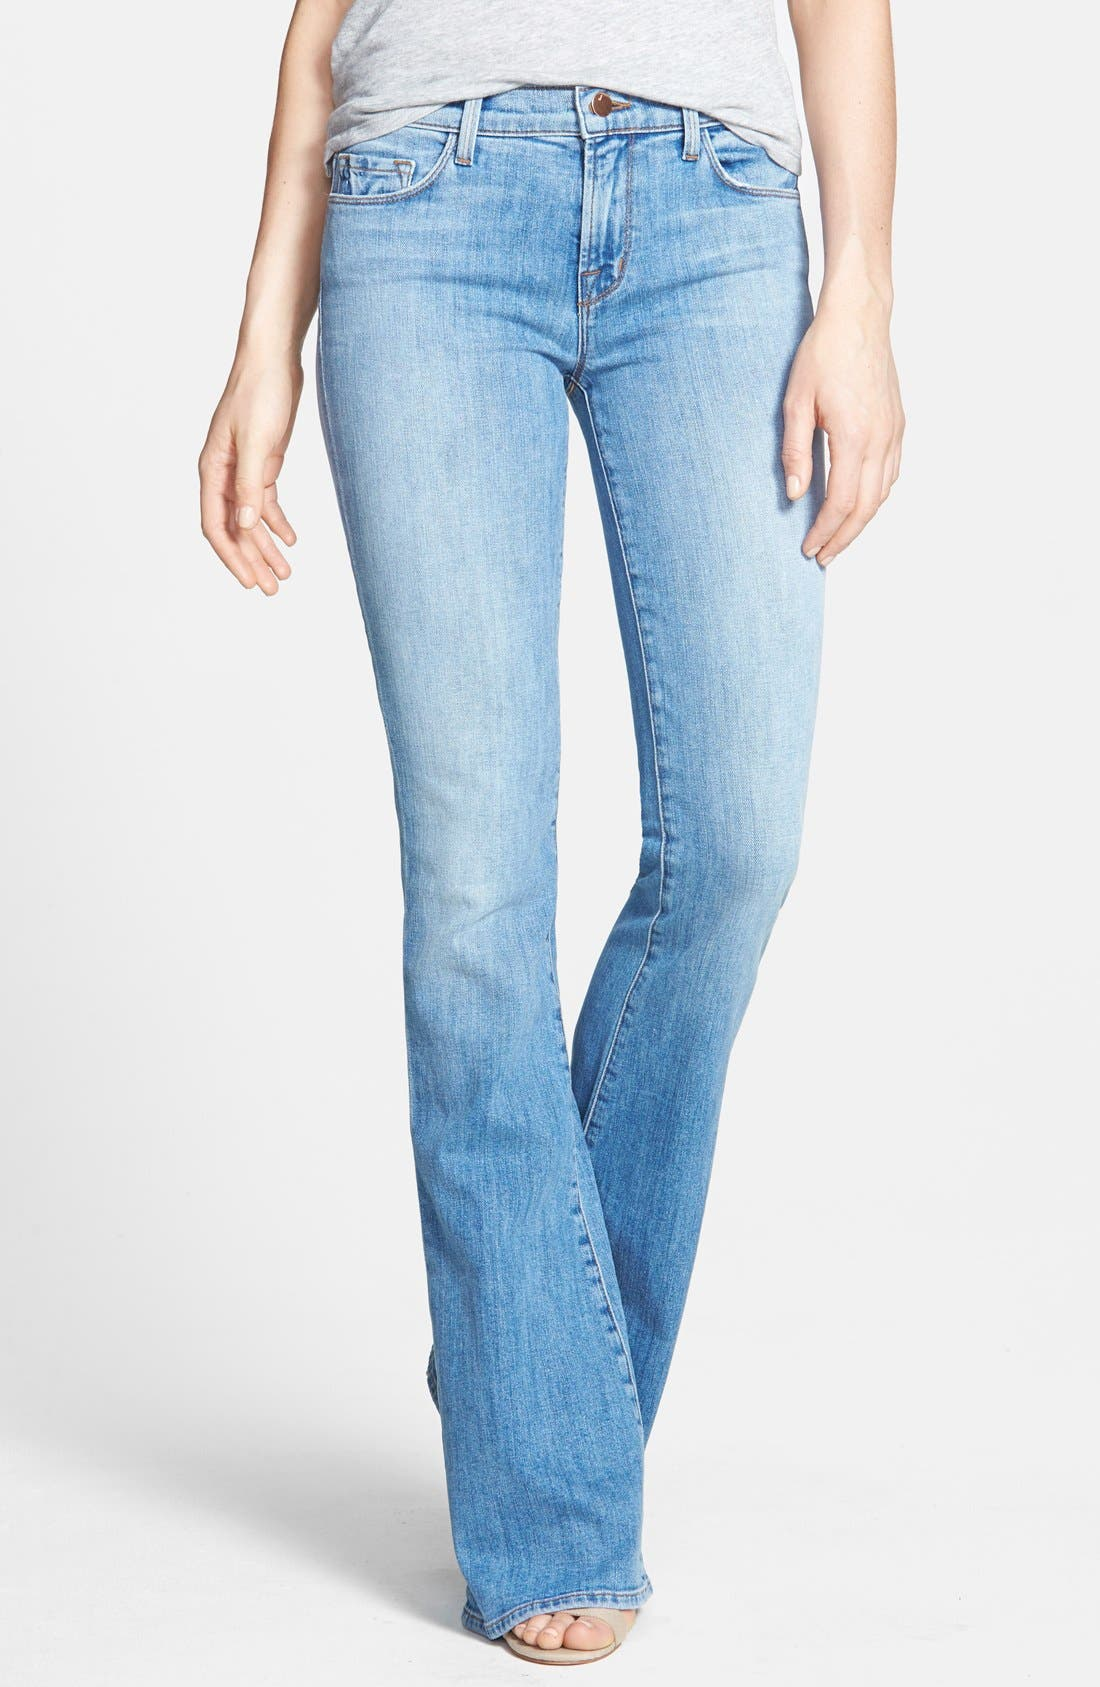 Alternate Image 1 Selected - J Brand 'Martini' Flared Jeans (Eternal)